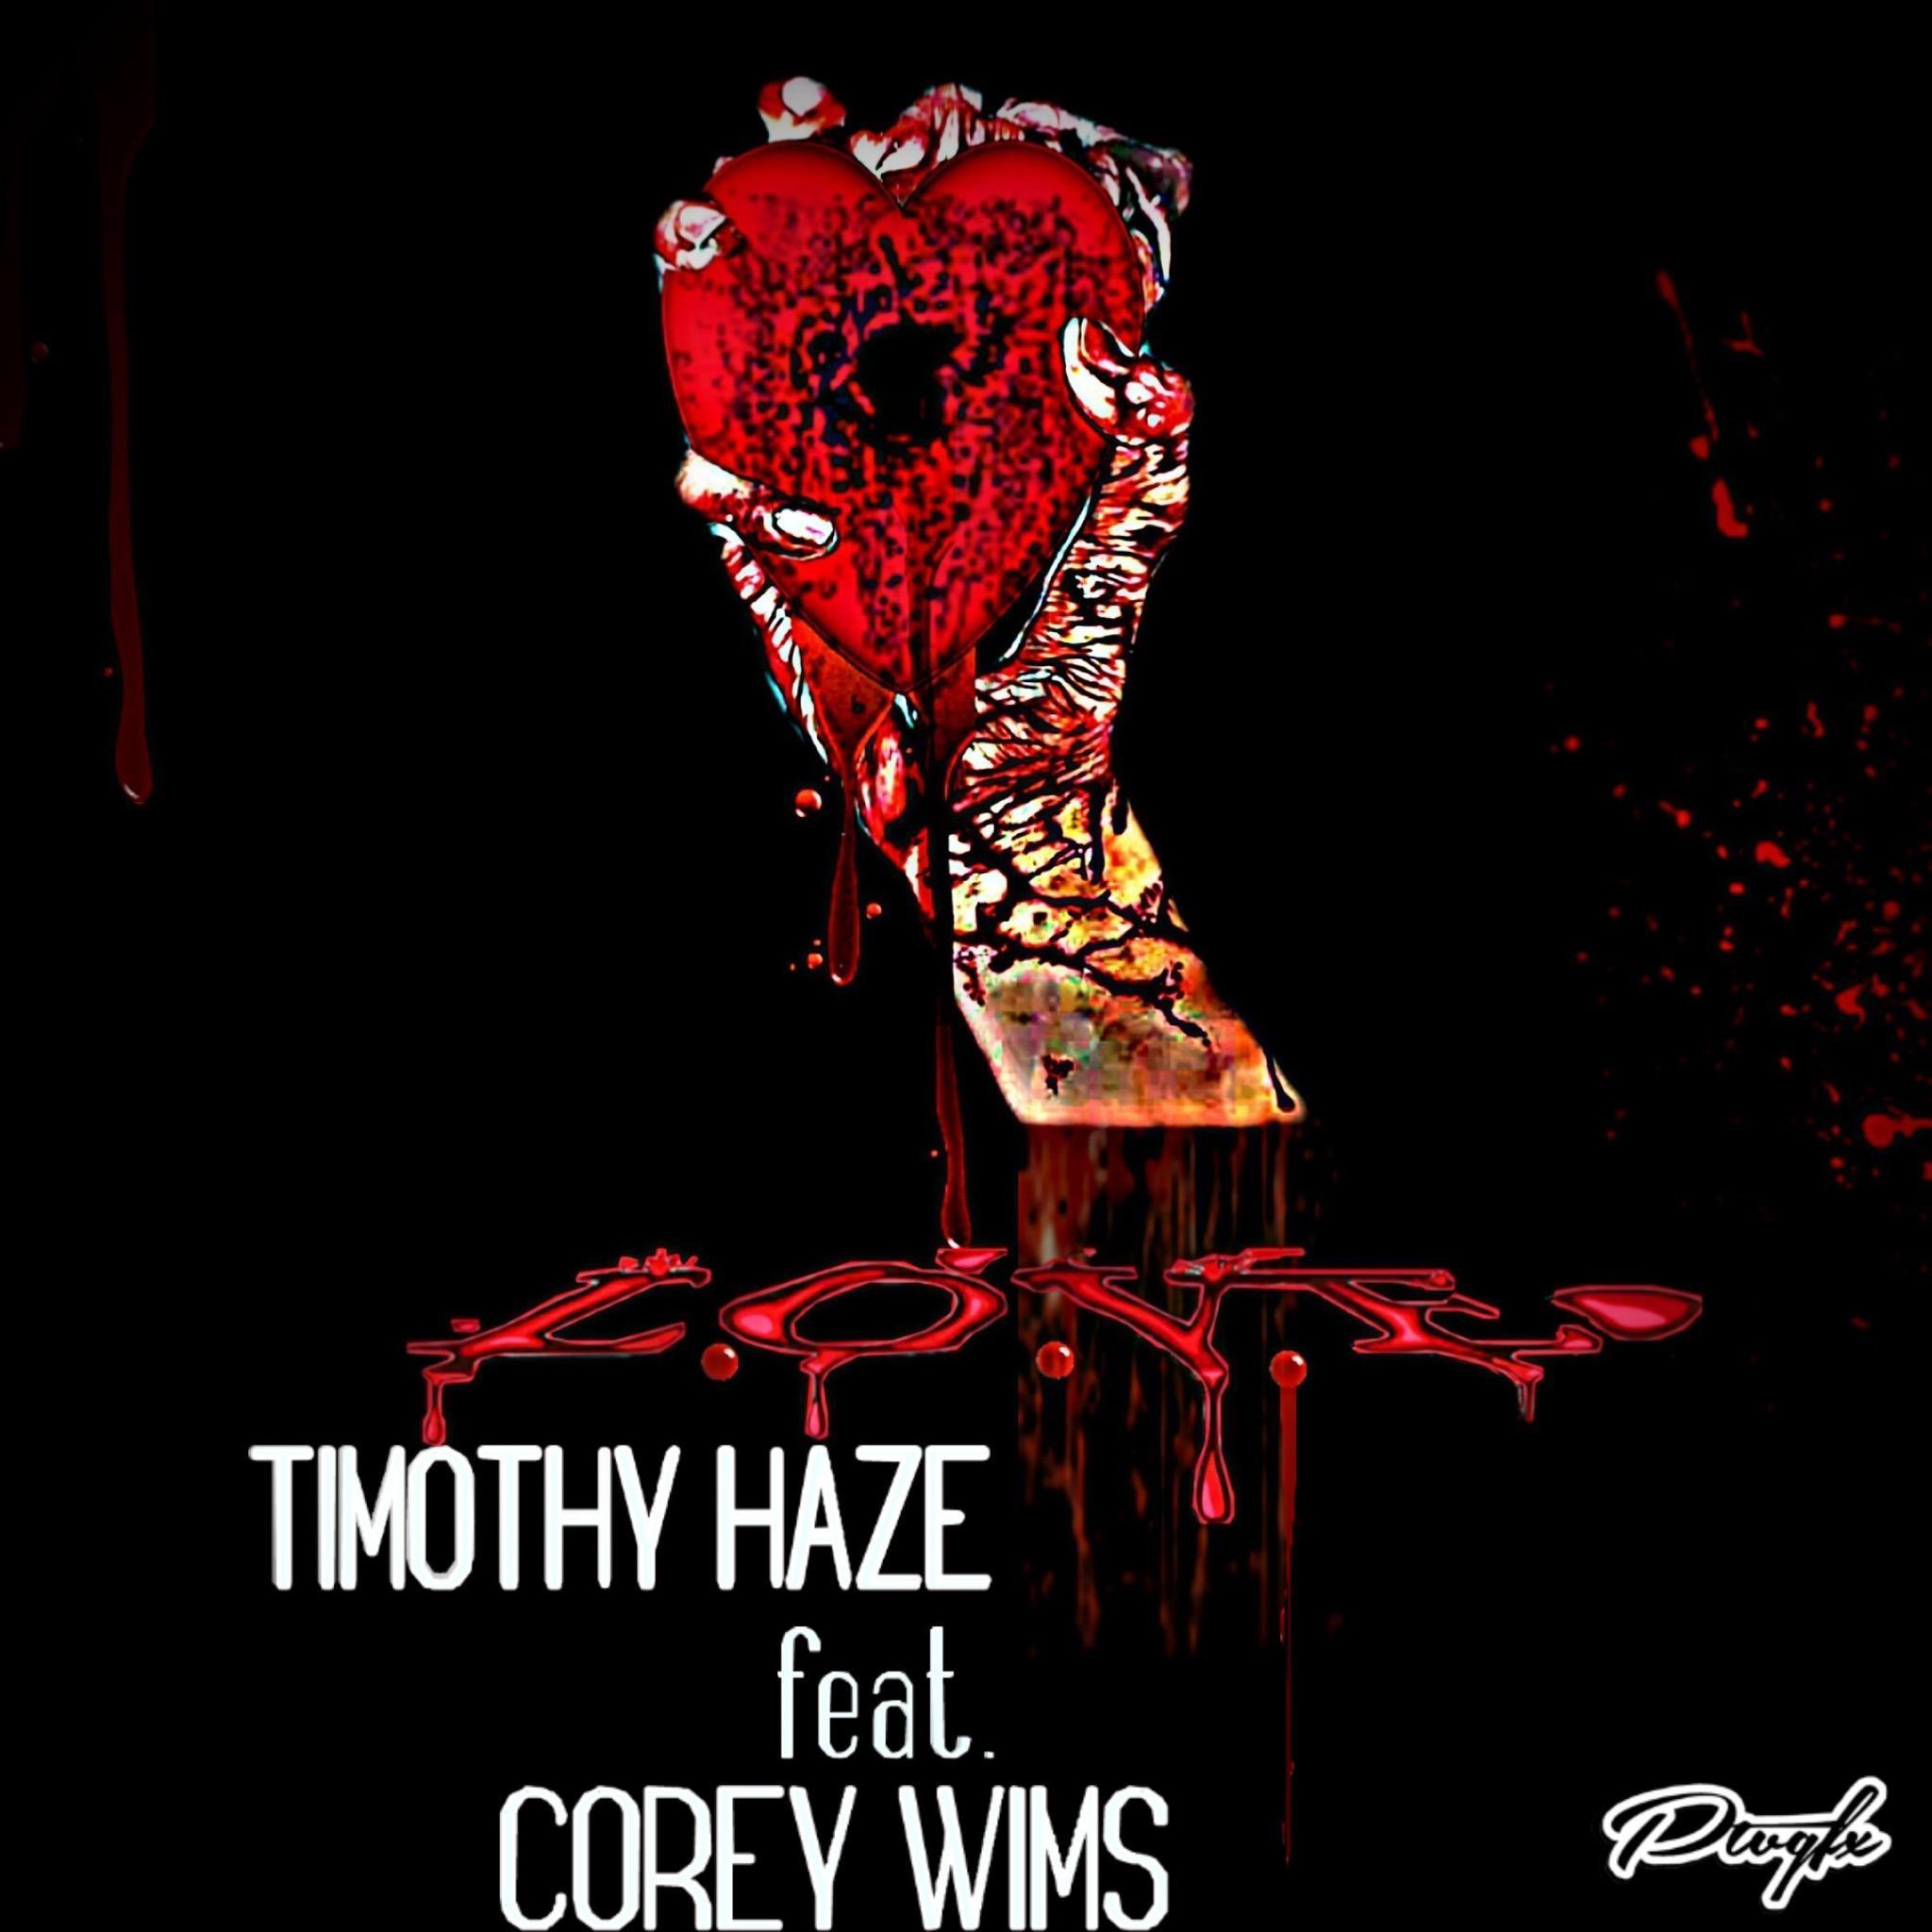 Timothy Haze Ft. Corey – Art for L.O.V.E.